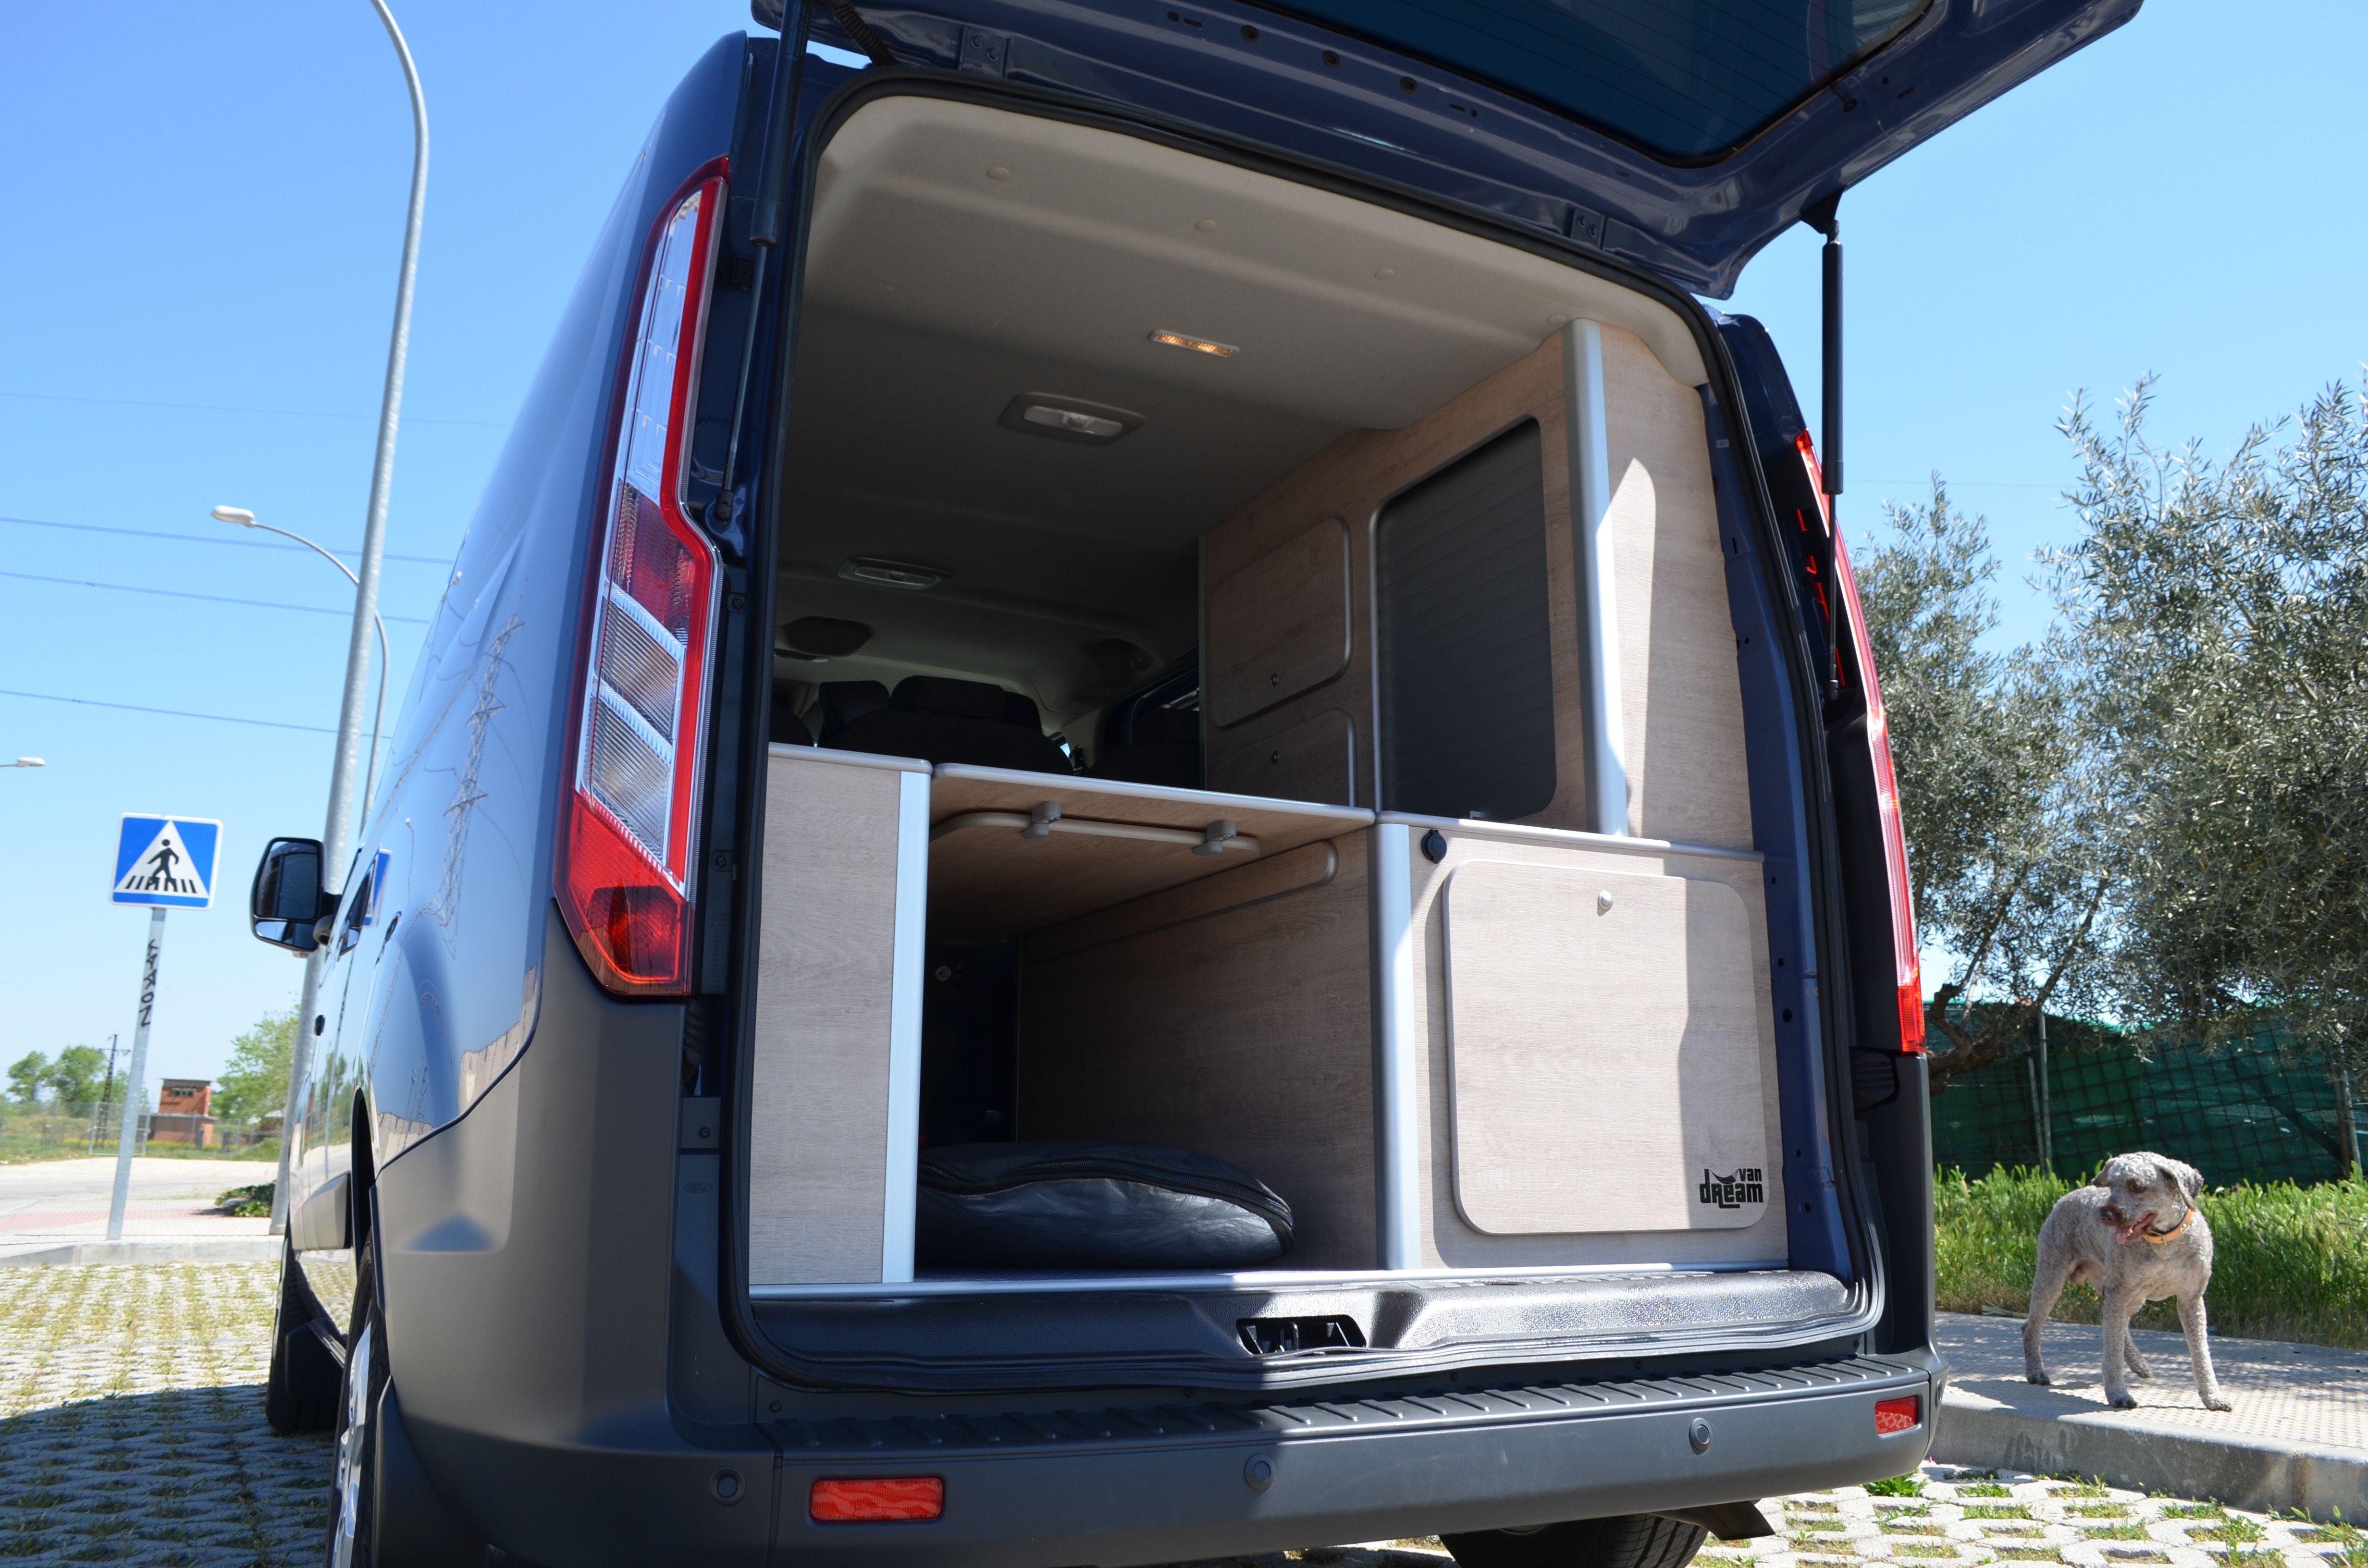 Ford Transit Custom 2017 Van Dream Madrid Surfvan Camperizacion Completa Mobiliario Nevera Cocina Agua